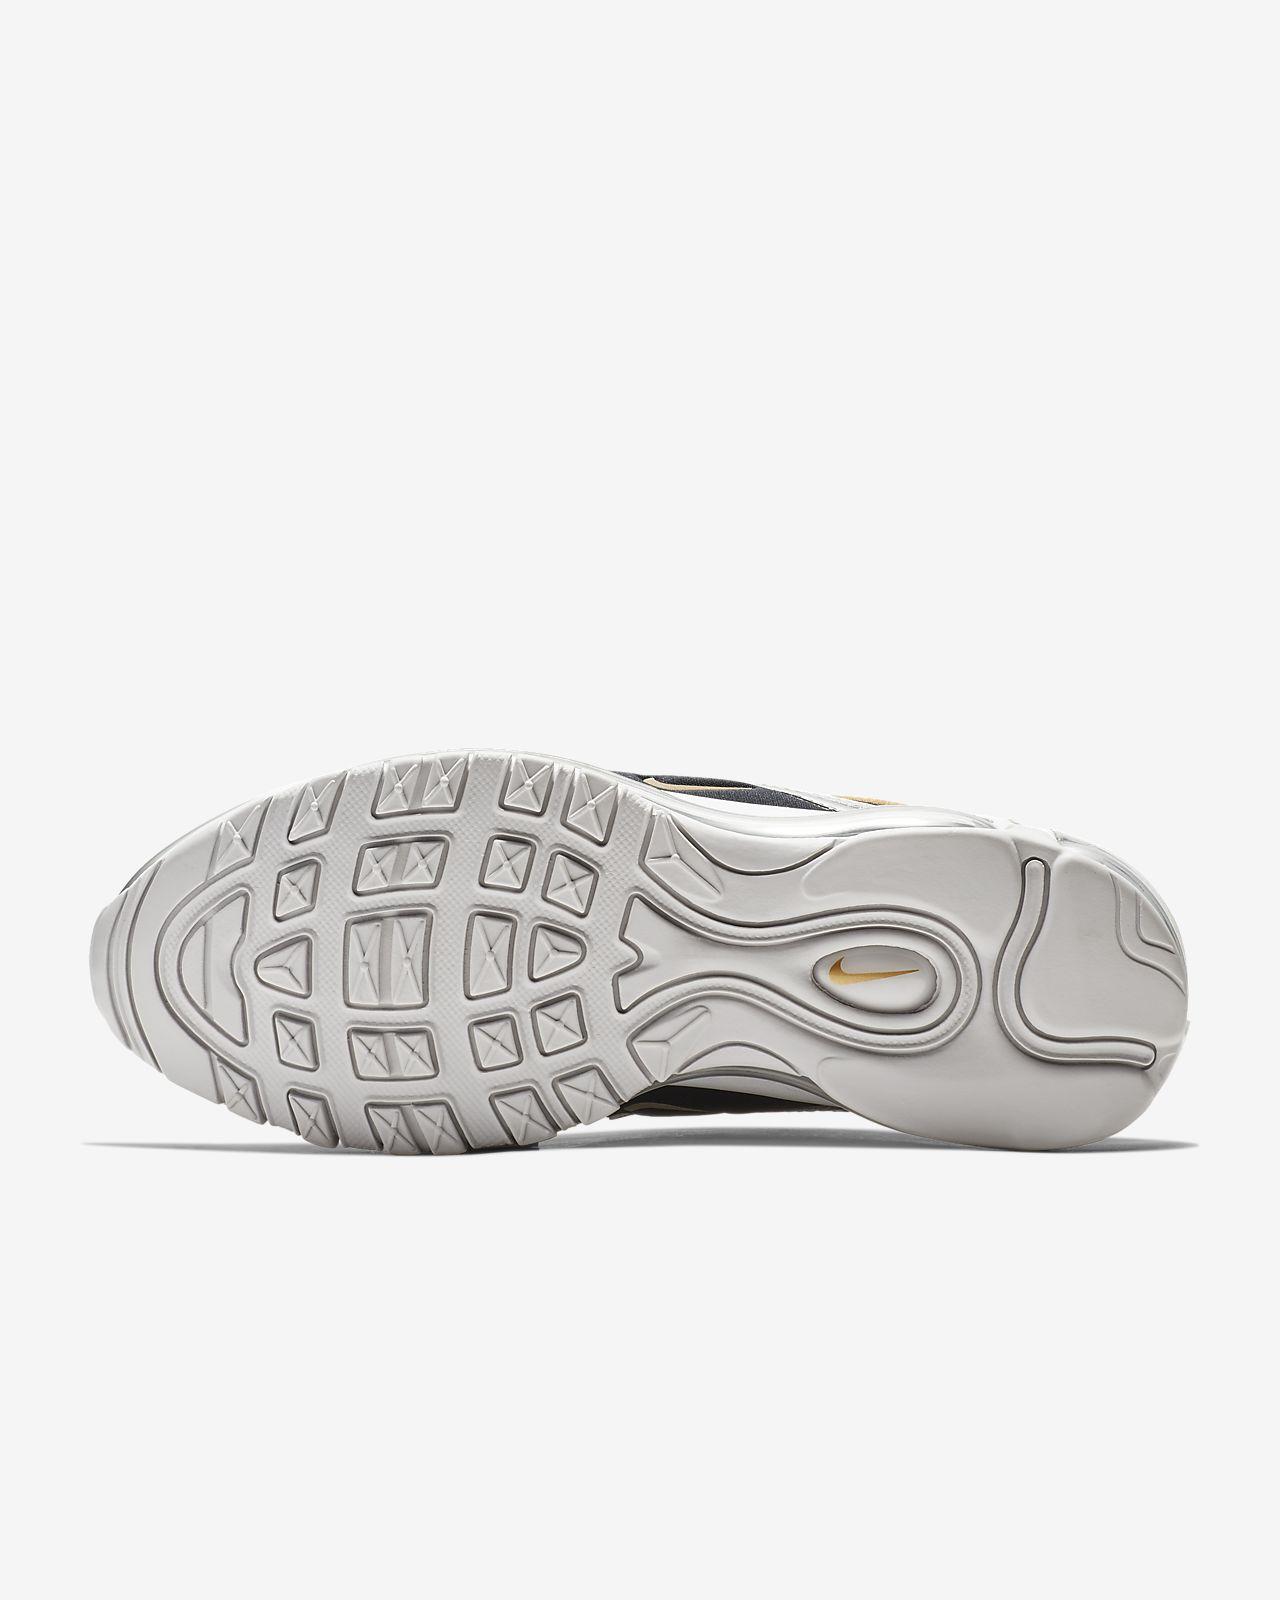 Chaussure Air Metallic Max Pour Se 97 Femme Nike K1J3TlFc